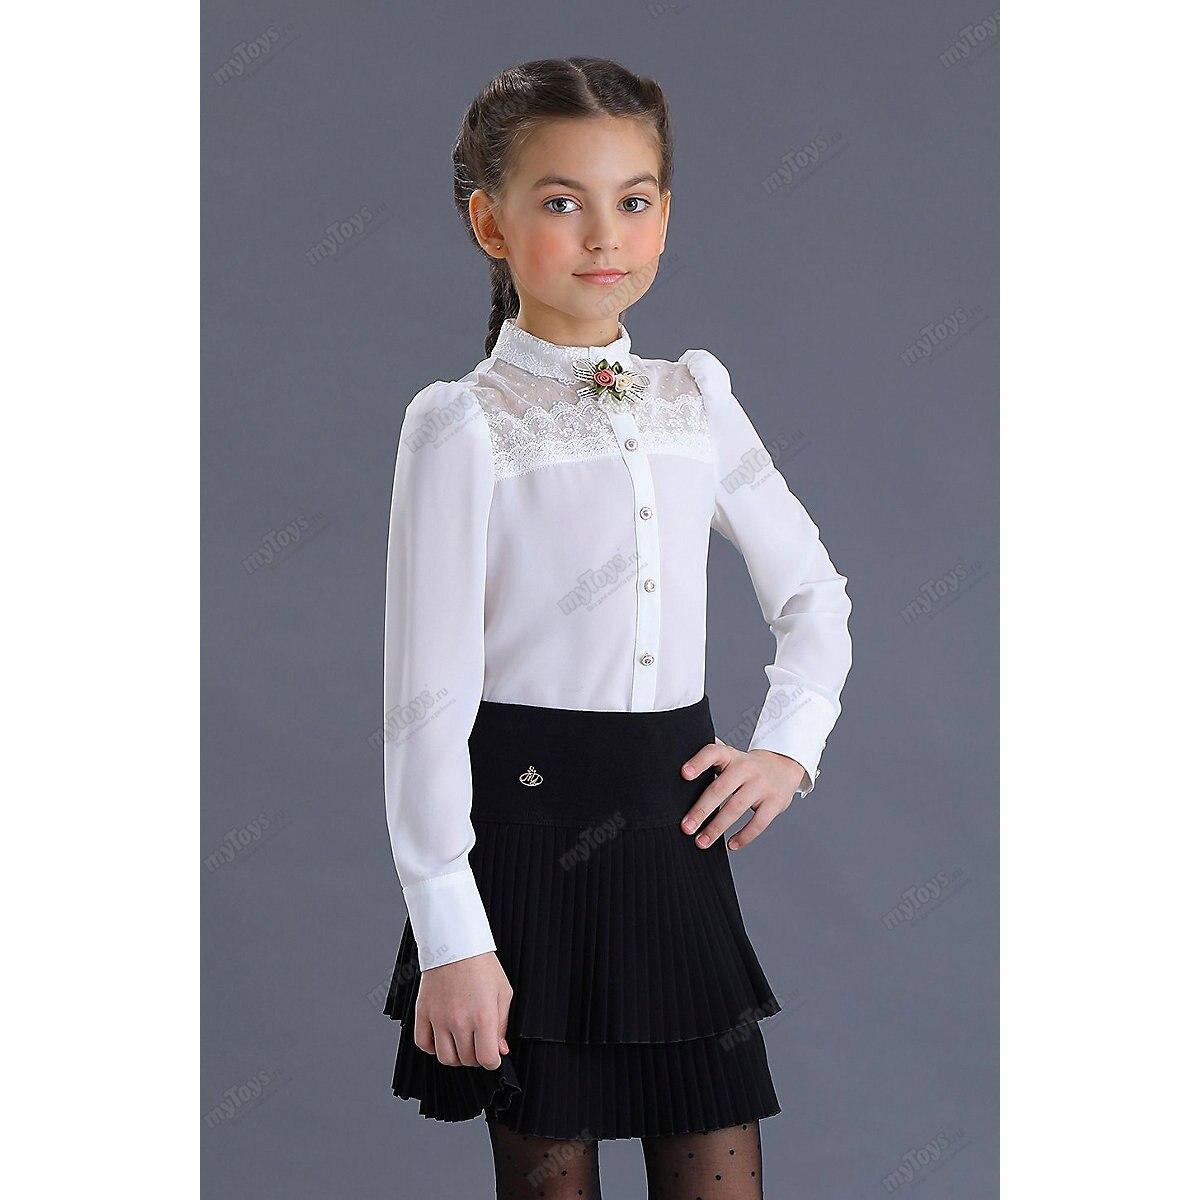 Malenkaya Lady Blouses & Shirts 11685811 blouse for girl school  clothes jacket wardrobe childrens shirt White Blue Girls Turn-down Collar